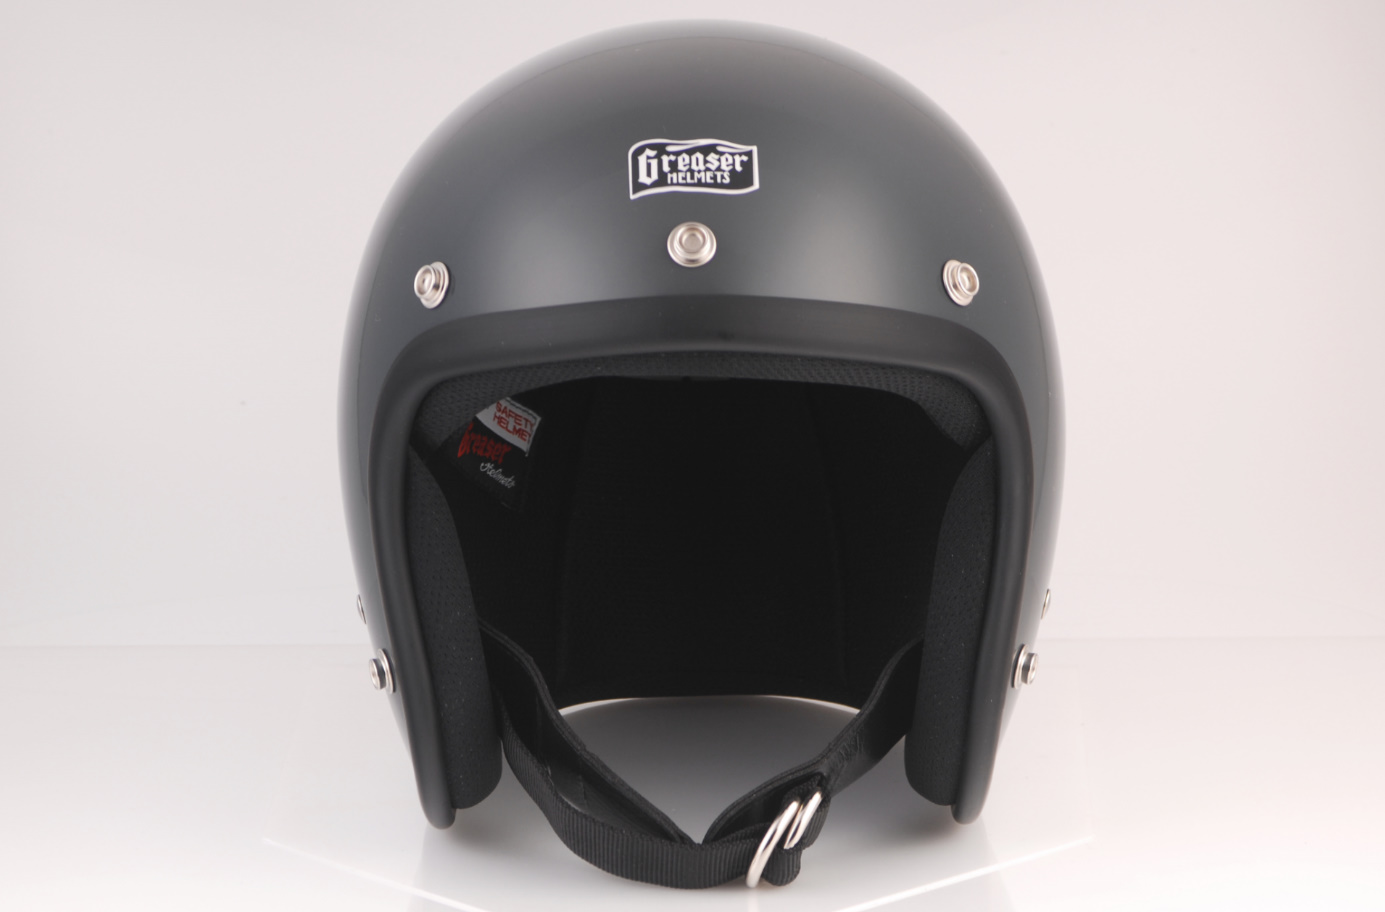 GREASER 60's PLAIN ジェットヘルメット ガンシップグレー M(57cm~58cm) GREASER(グリーサー)